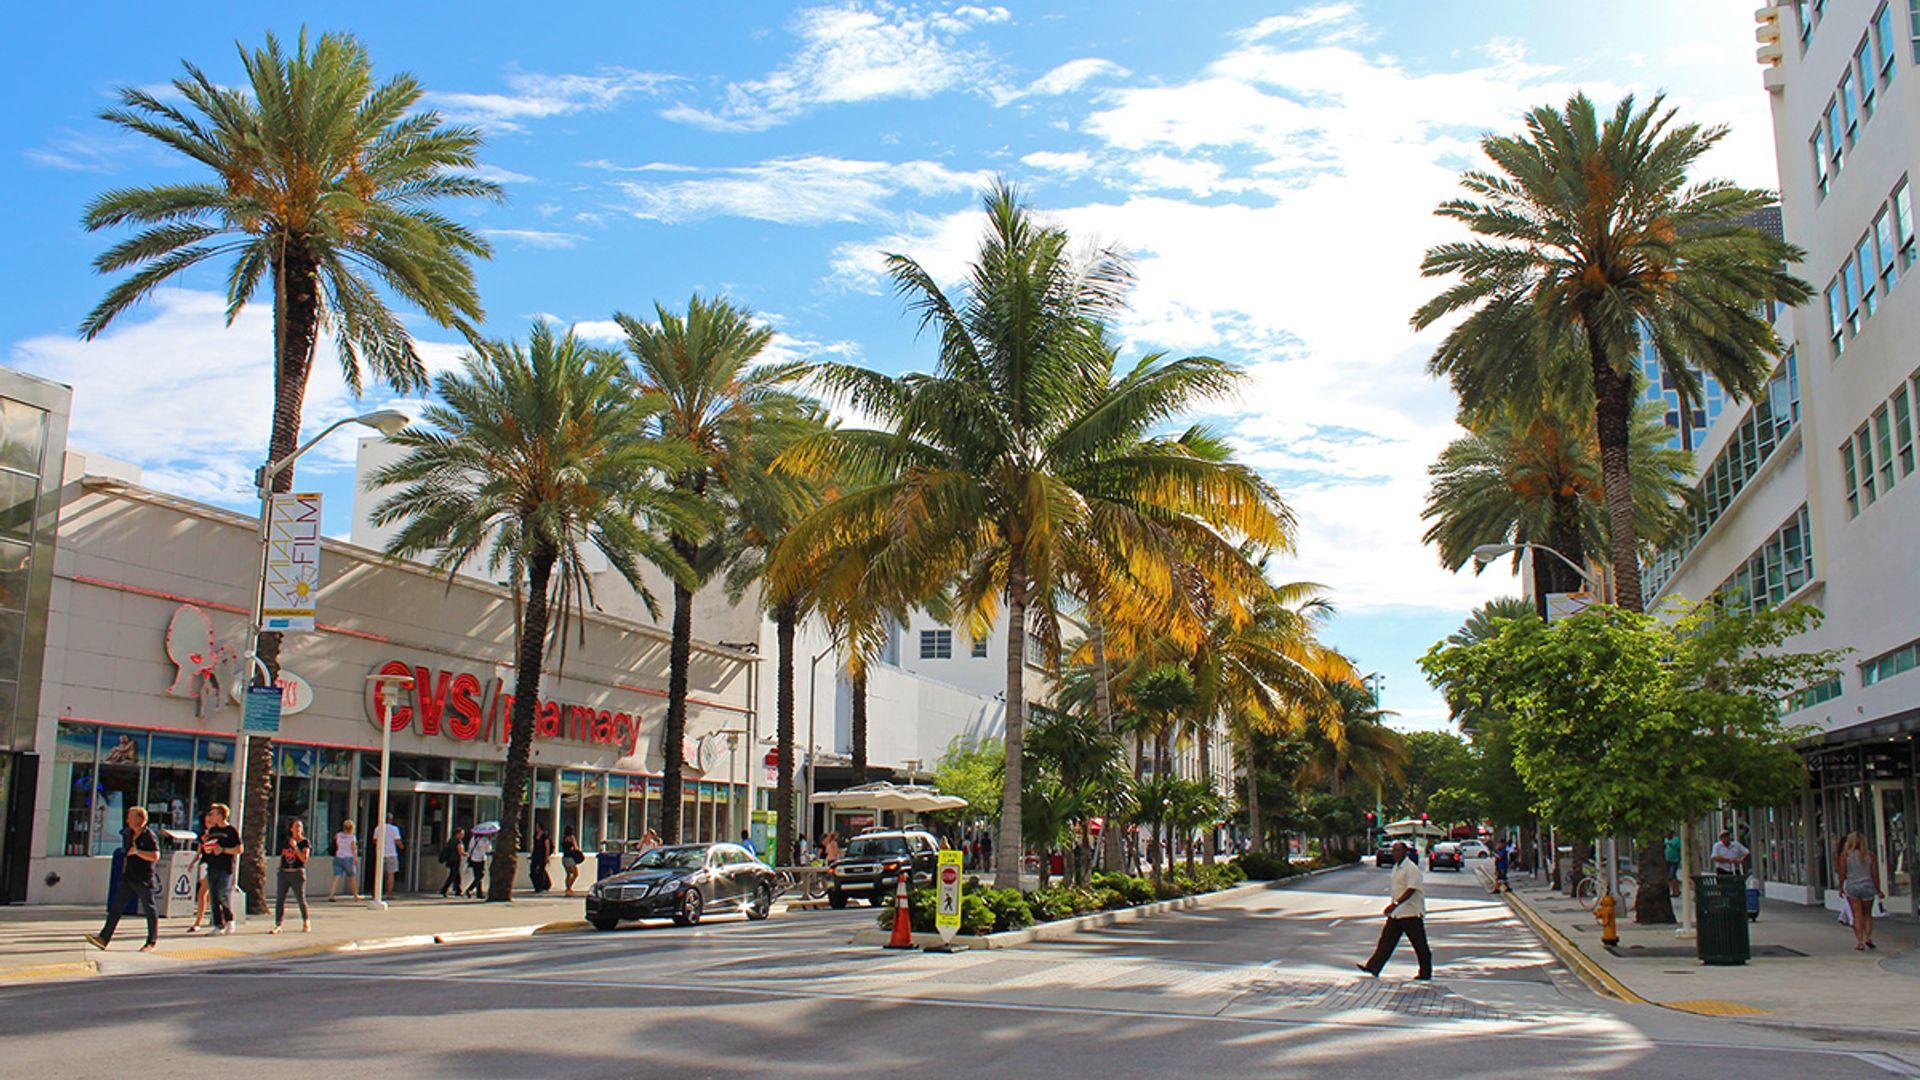 Sejur Miami, 8 zile - ianuarie 2022